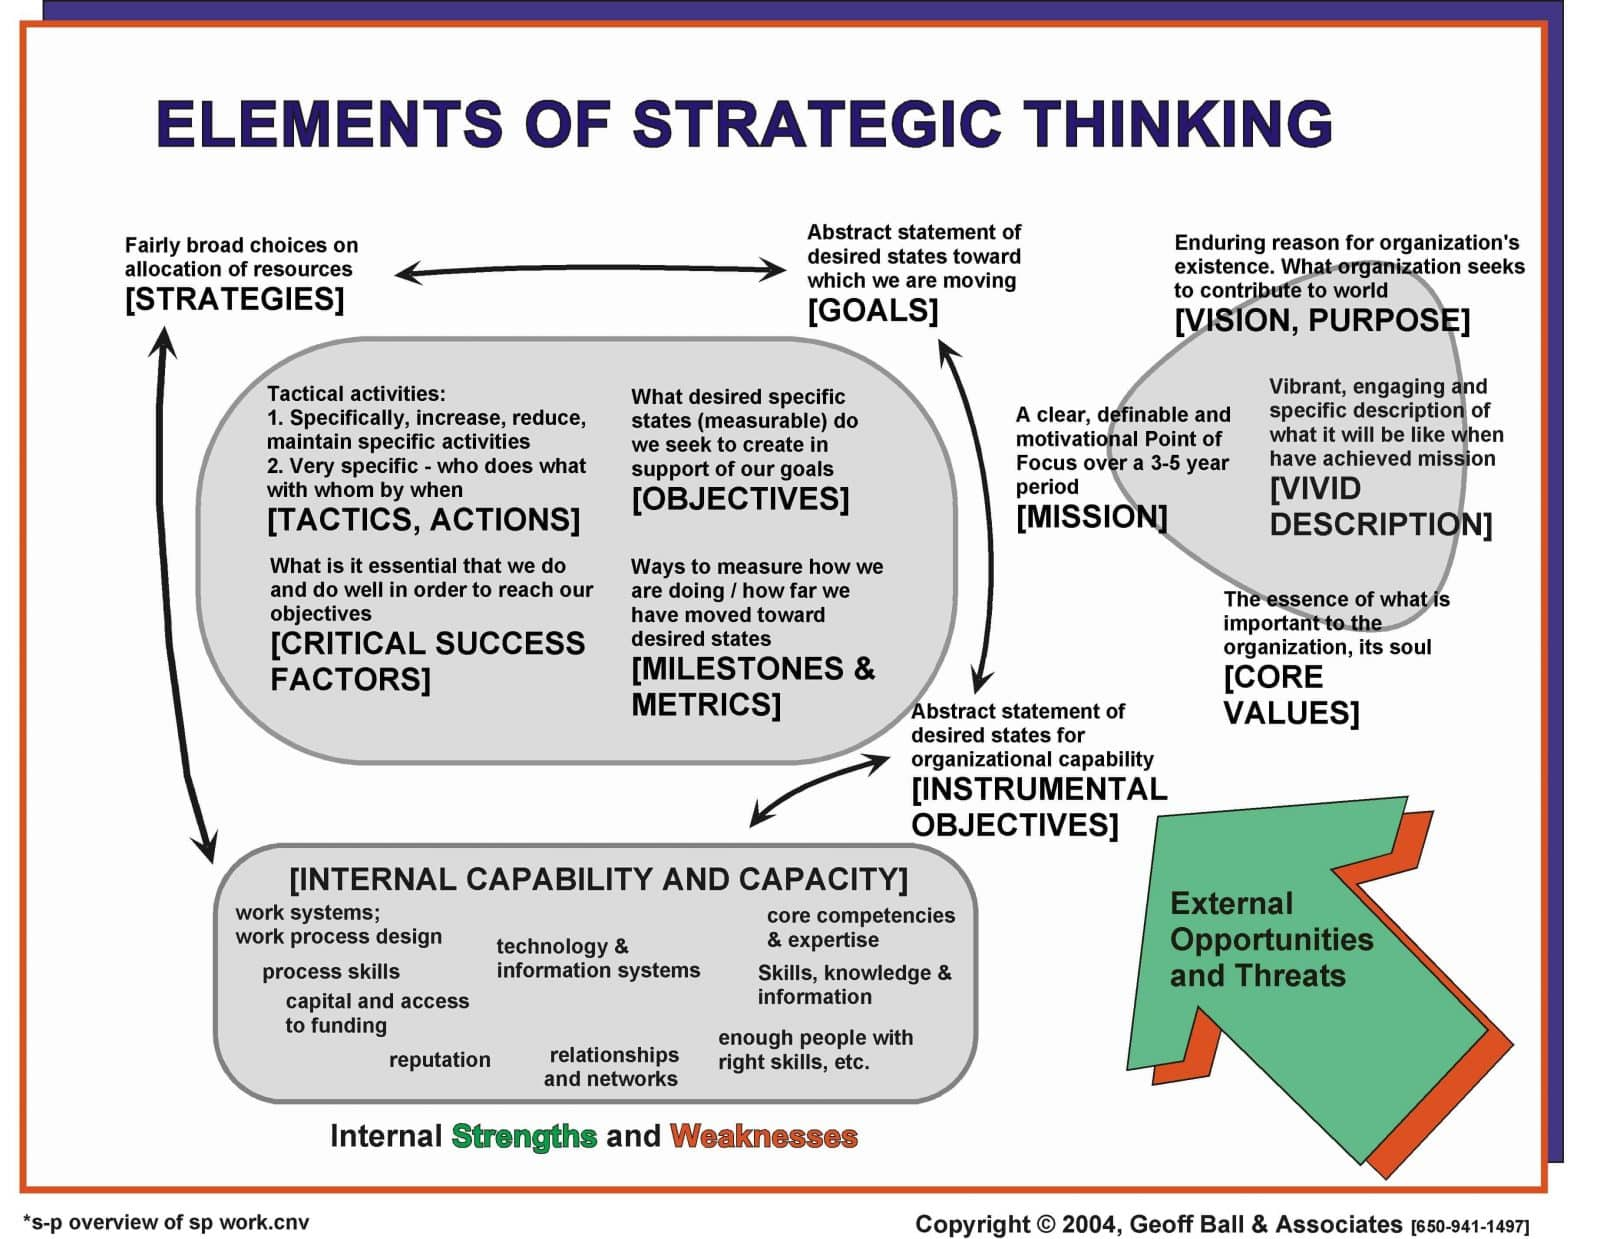 strategic thinking elements chart